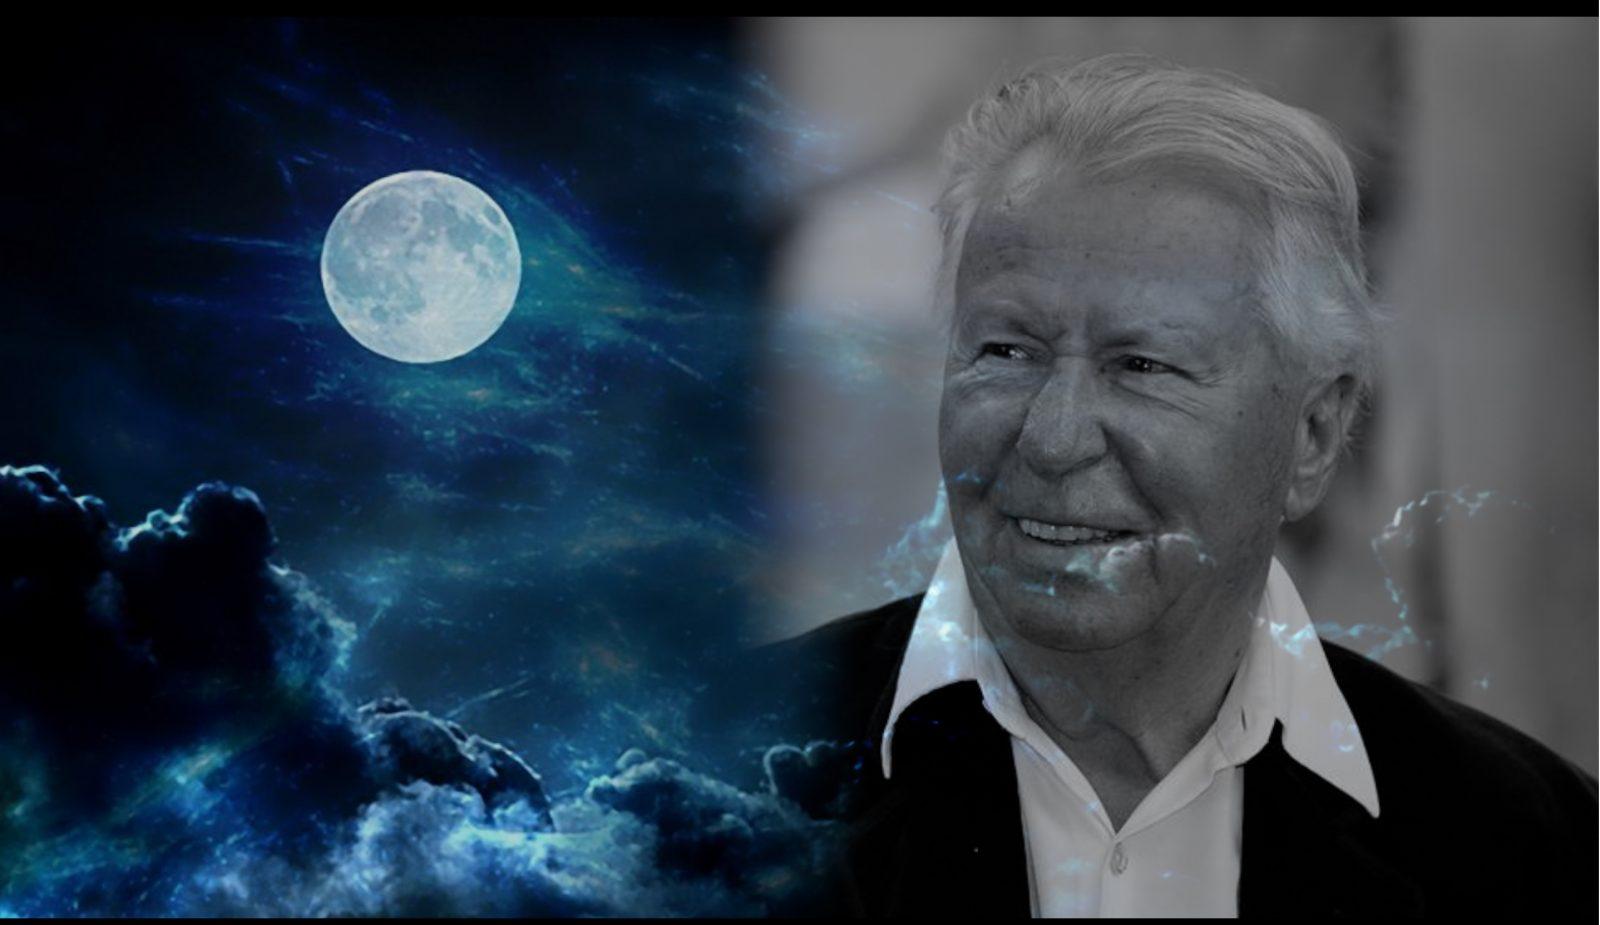 LA CHRONIQUE DE ROMAIN BOFI – Au clair de la lune, mon ami Pierrot…